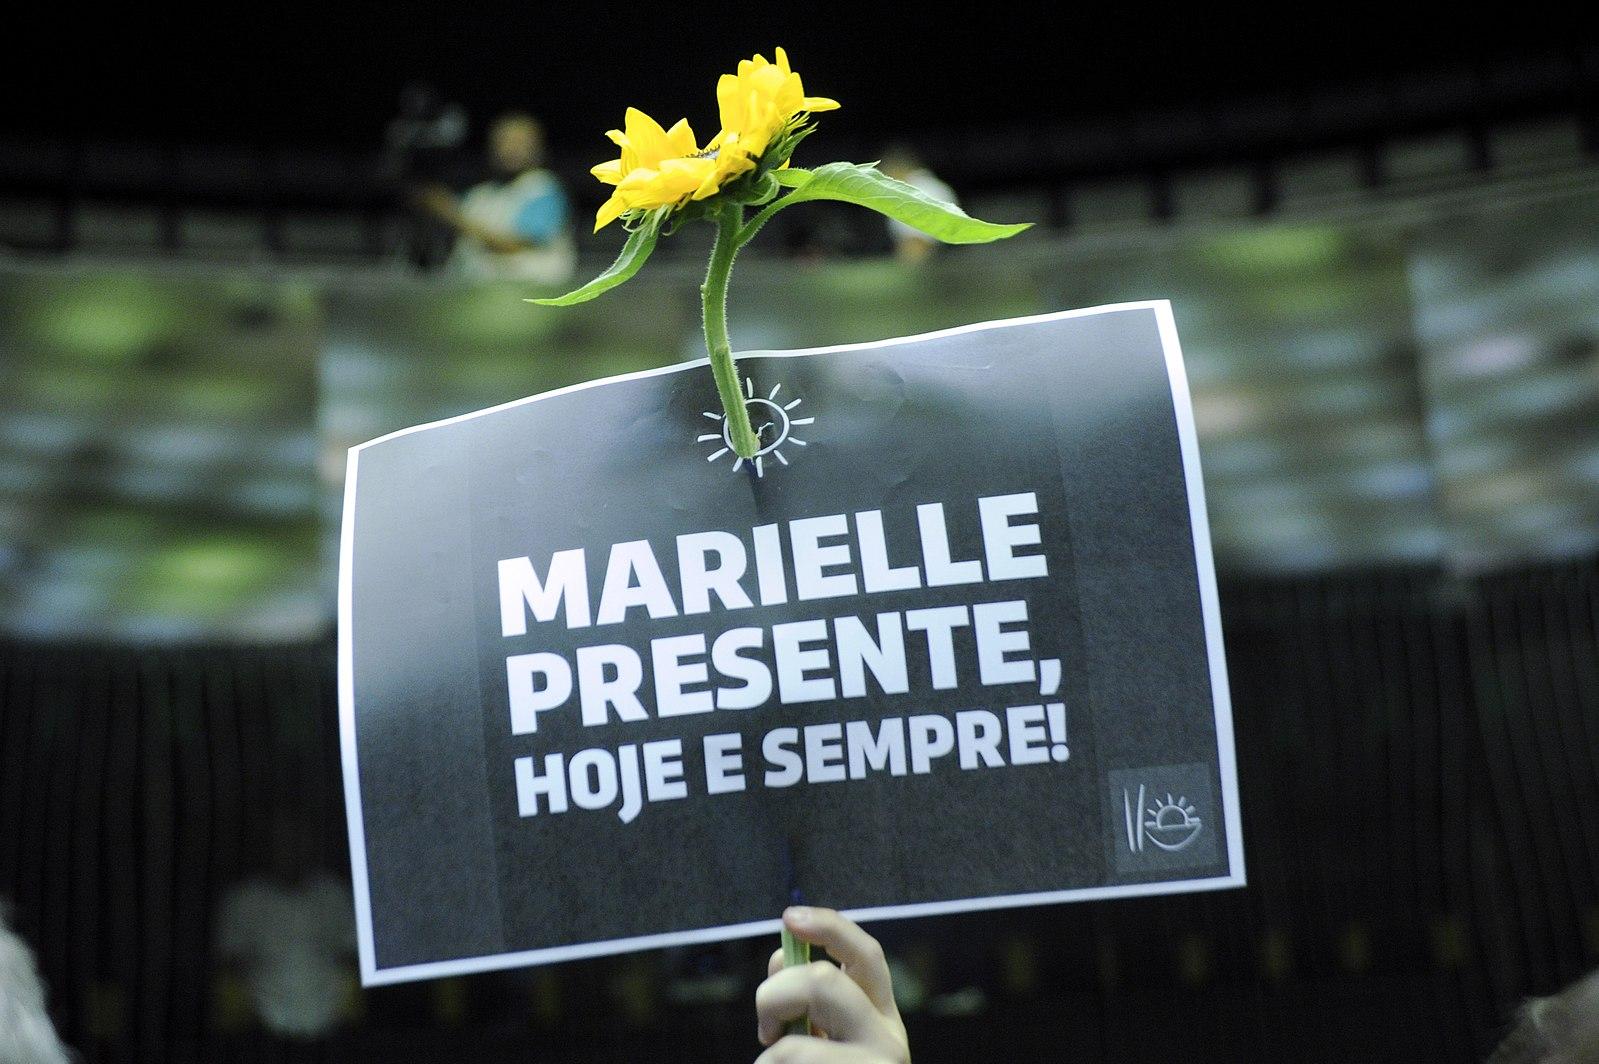 1599px-Marielle_presente,_hoje_e_sempre!_(2).jpg